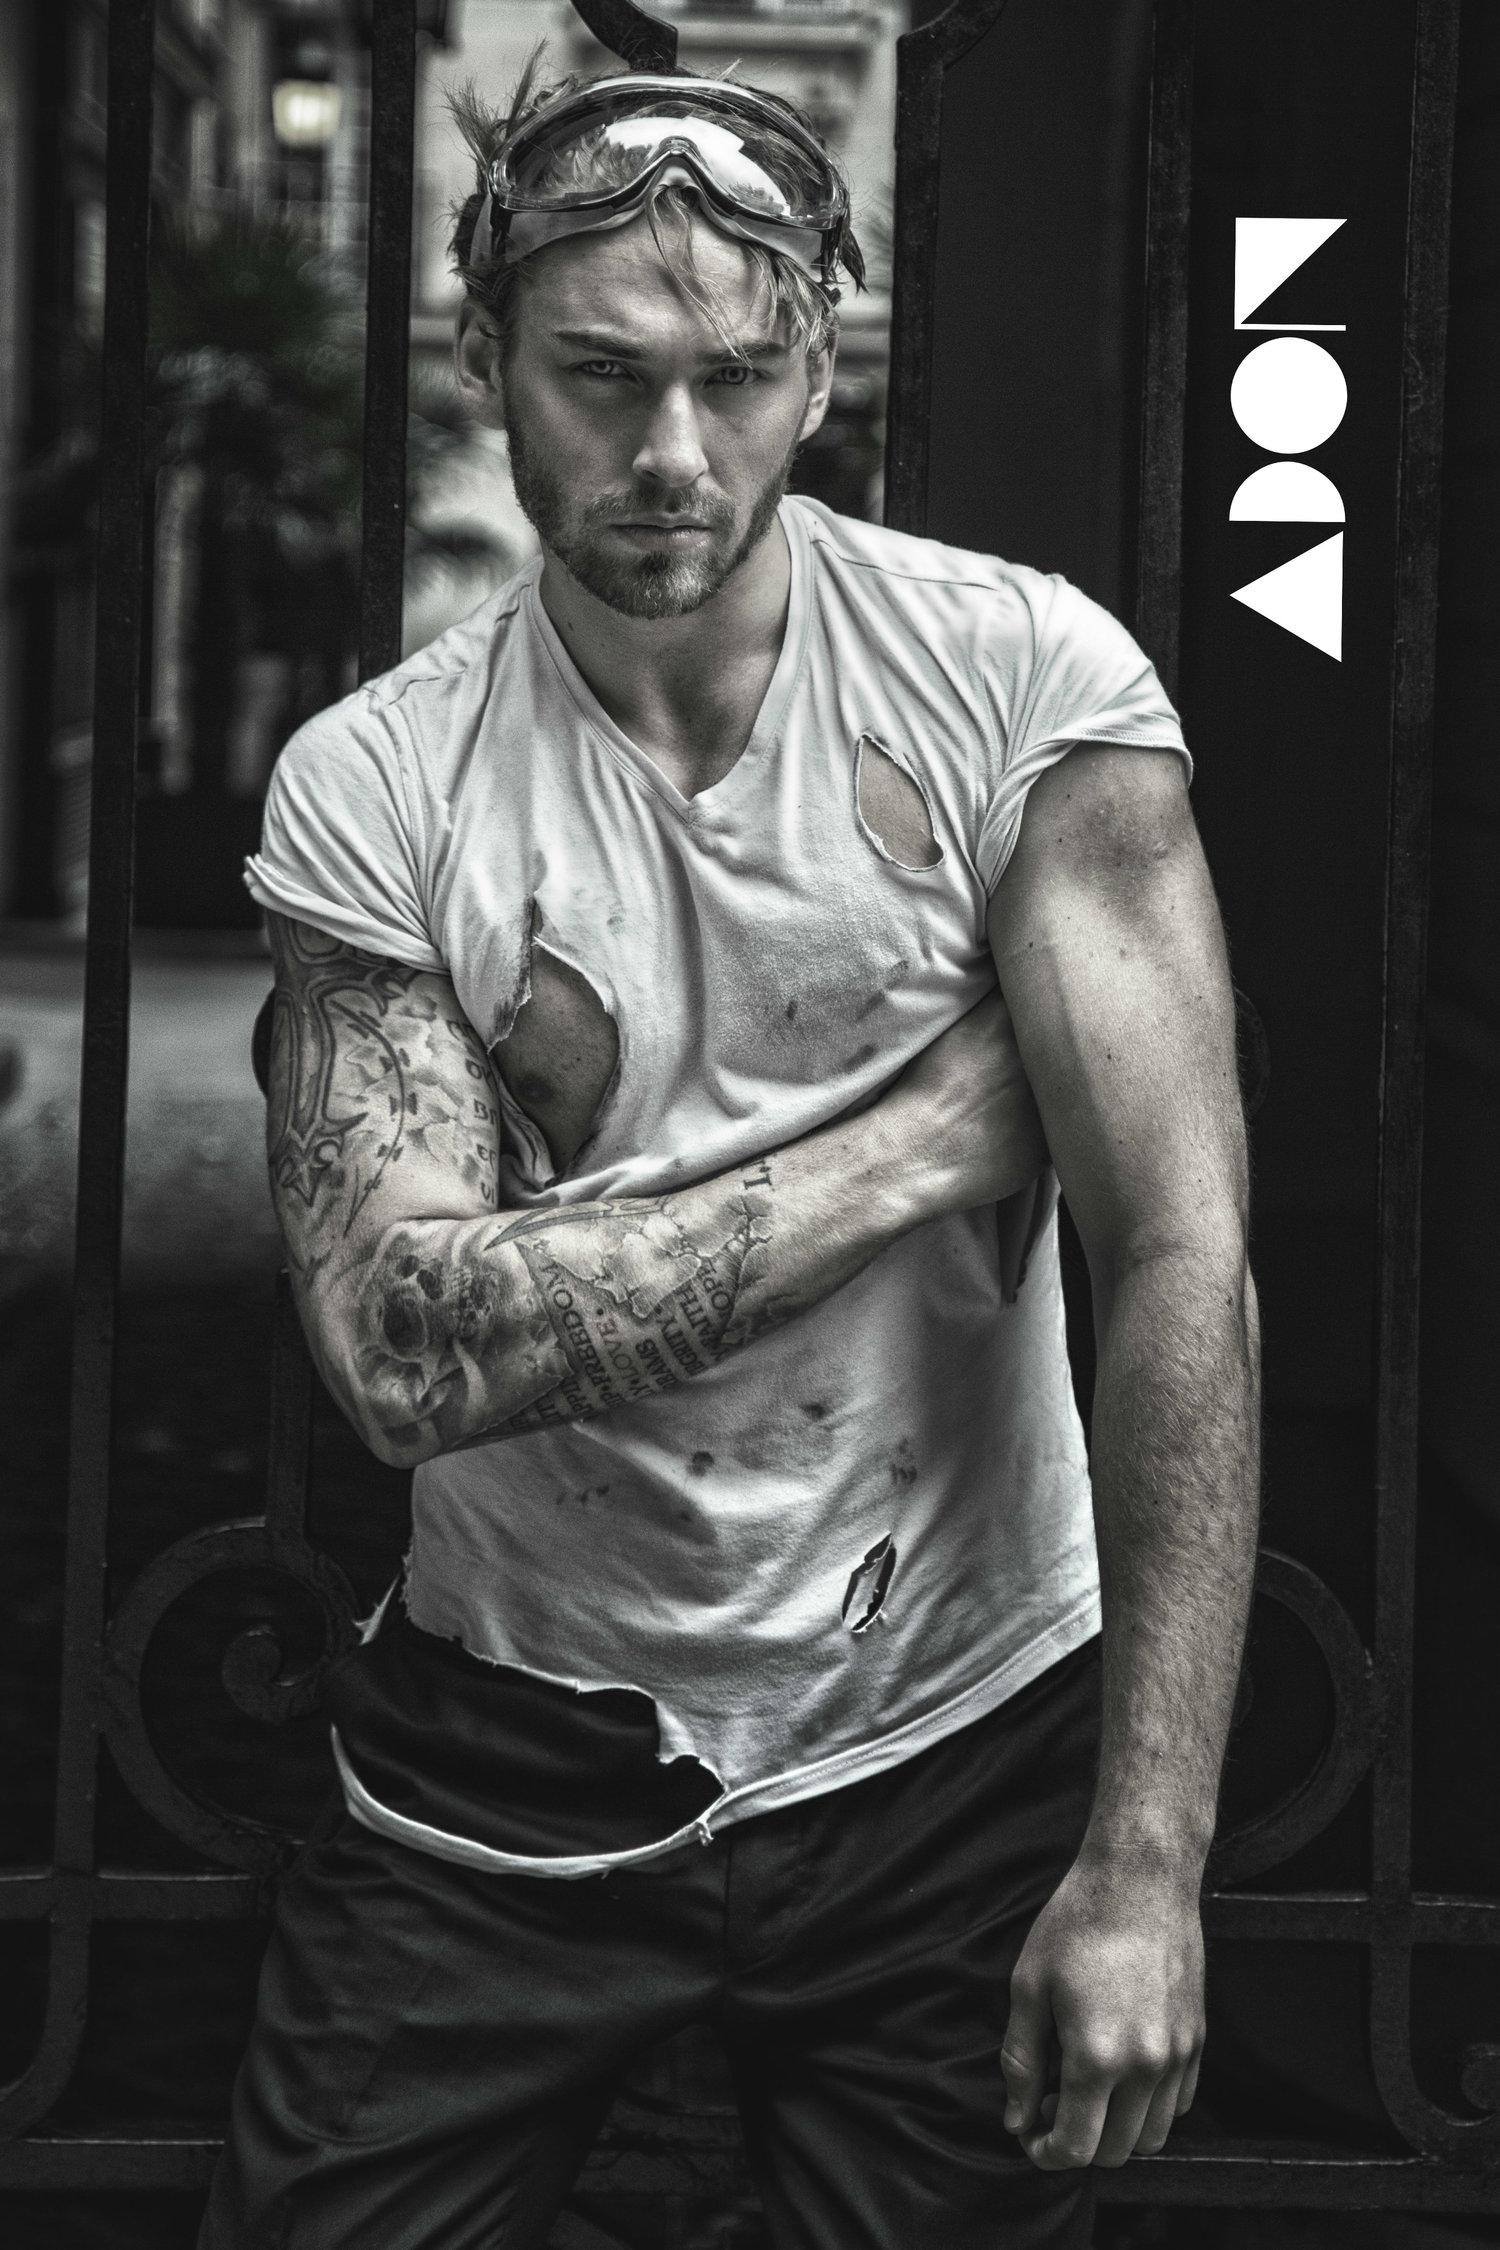 Adon Exclusive: Model Roman Federchenko By Ramy Gad